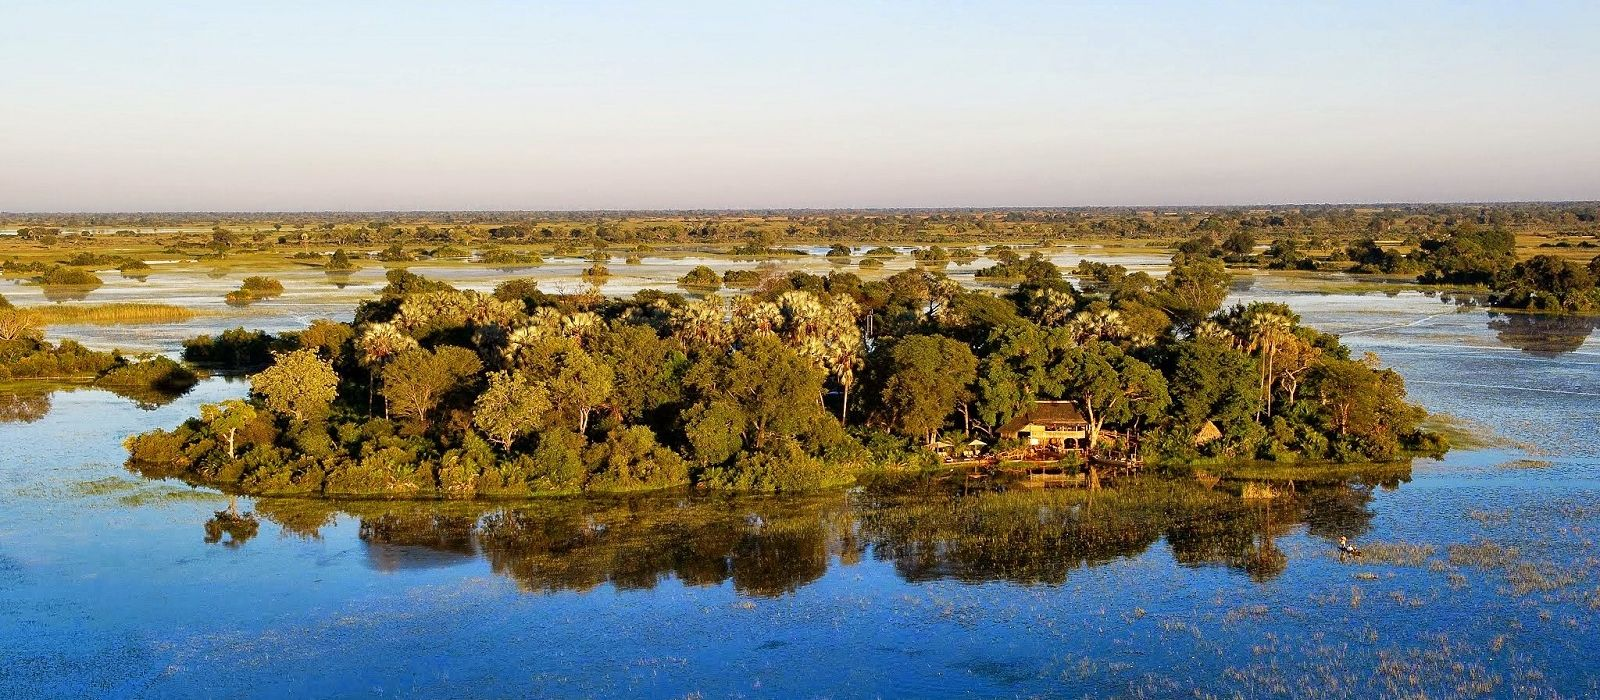 Wings over Botswana Tour Trip 3